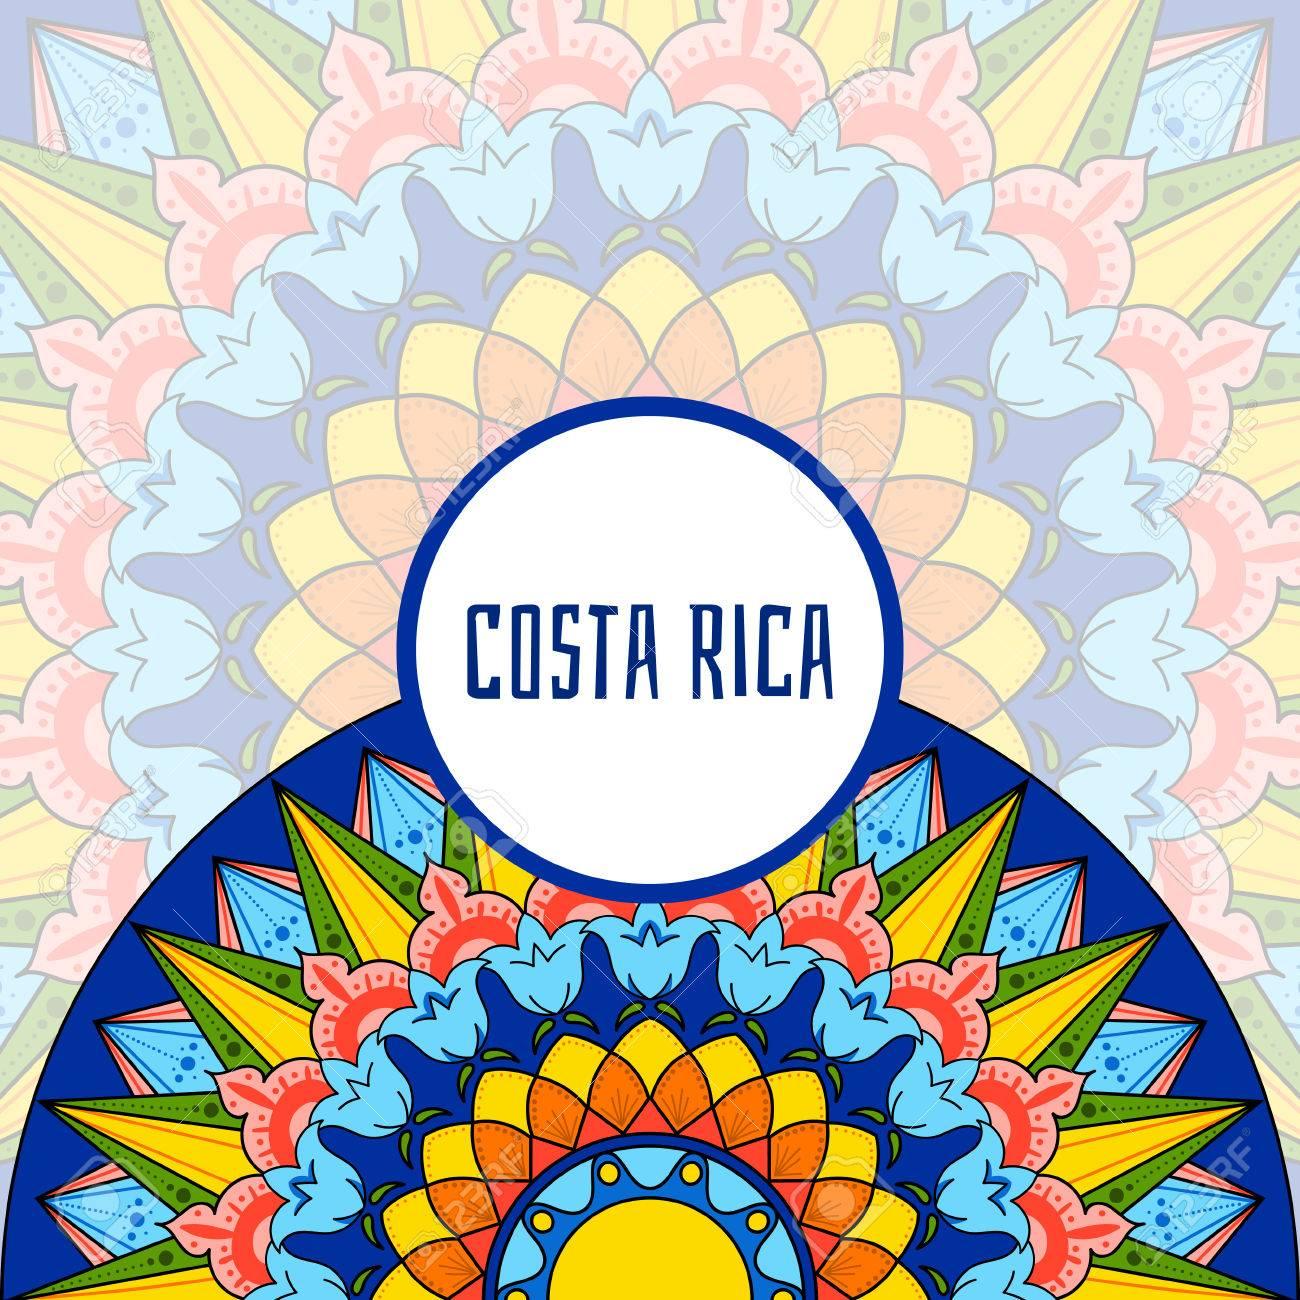 Costa rica illustration vector decorated coffee carreta ornament costa rica illustration vector decorated coffee carreta ornament wheel design for tourist symbols souvenir biocorpaavc Gallery